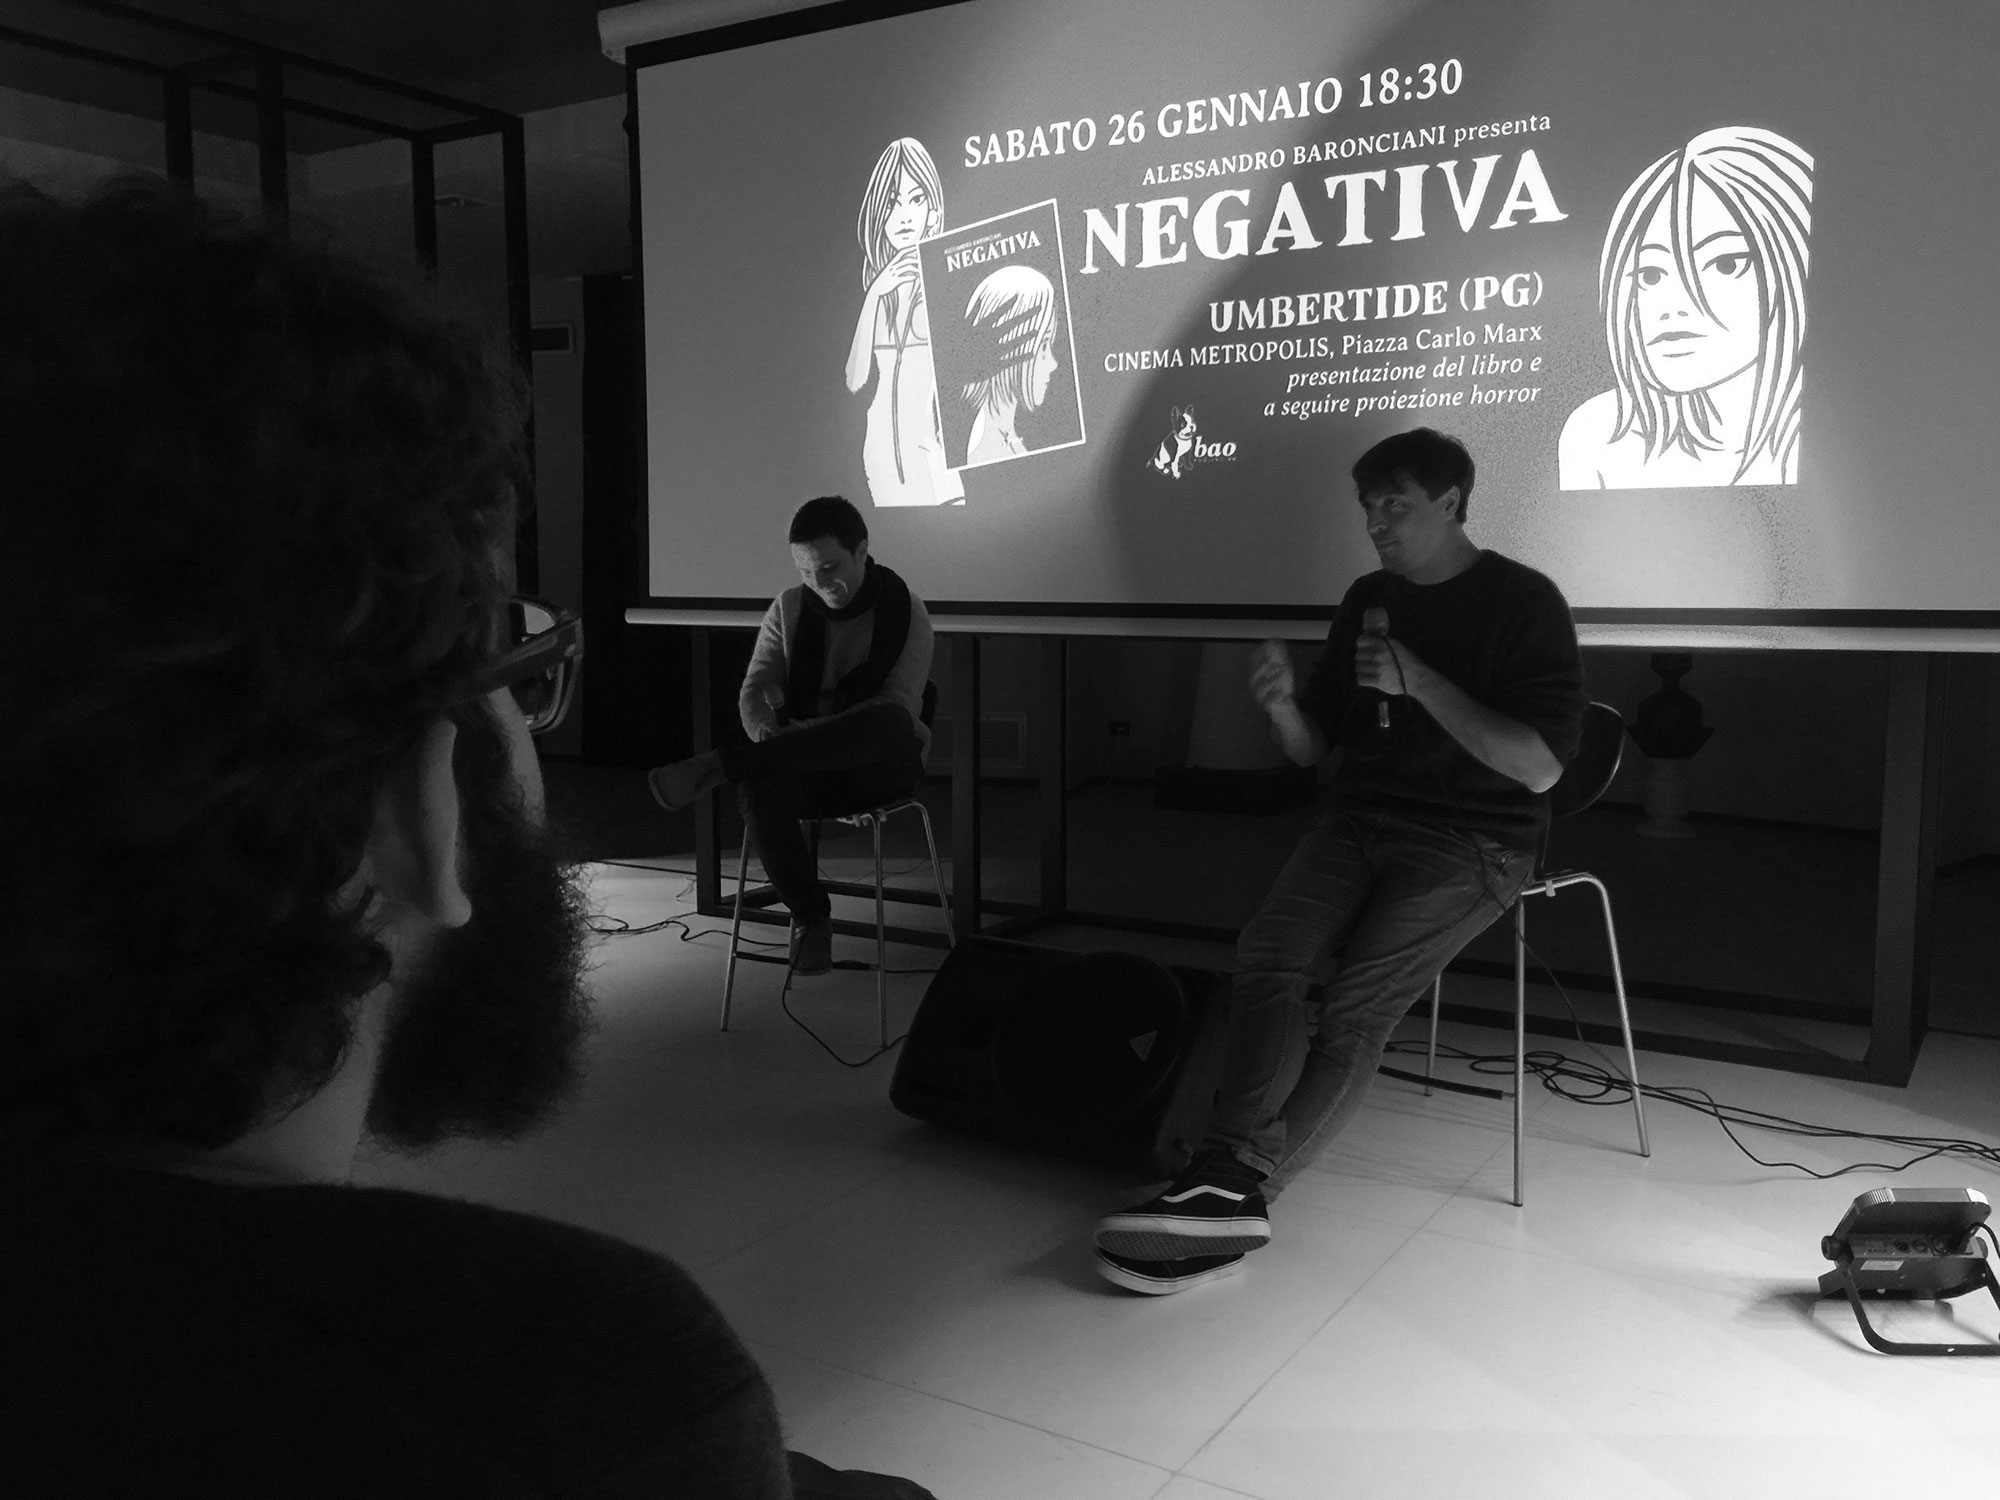 Alessandro Baronciani parla del suo libro NEGATIVA al cinema Metropolis di Umbertide